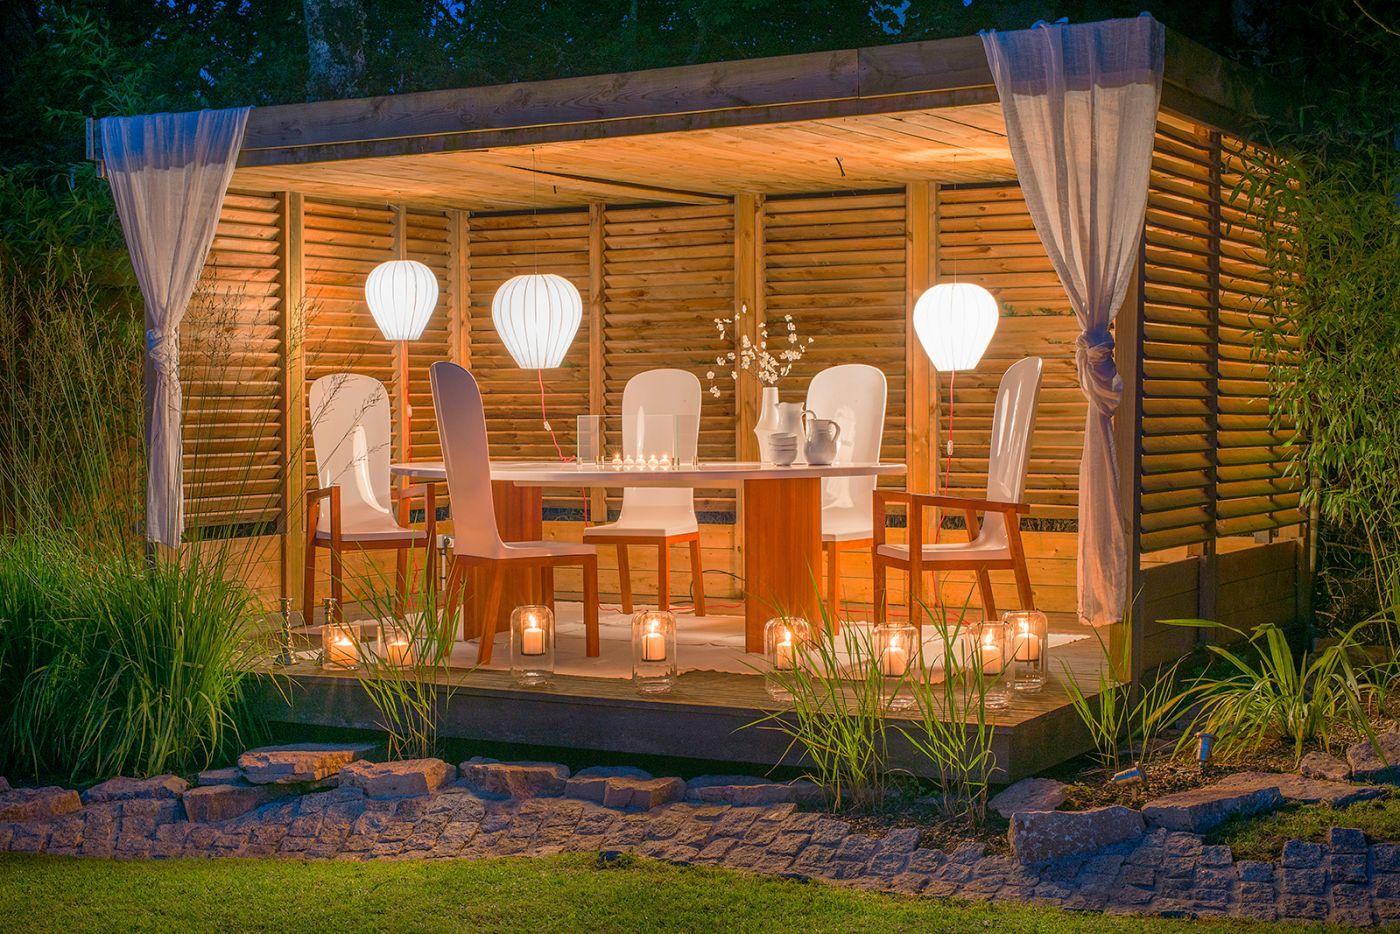 Fauteuil jardin design FJORD Art'Mely moabi composites